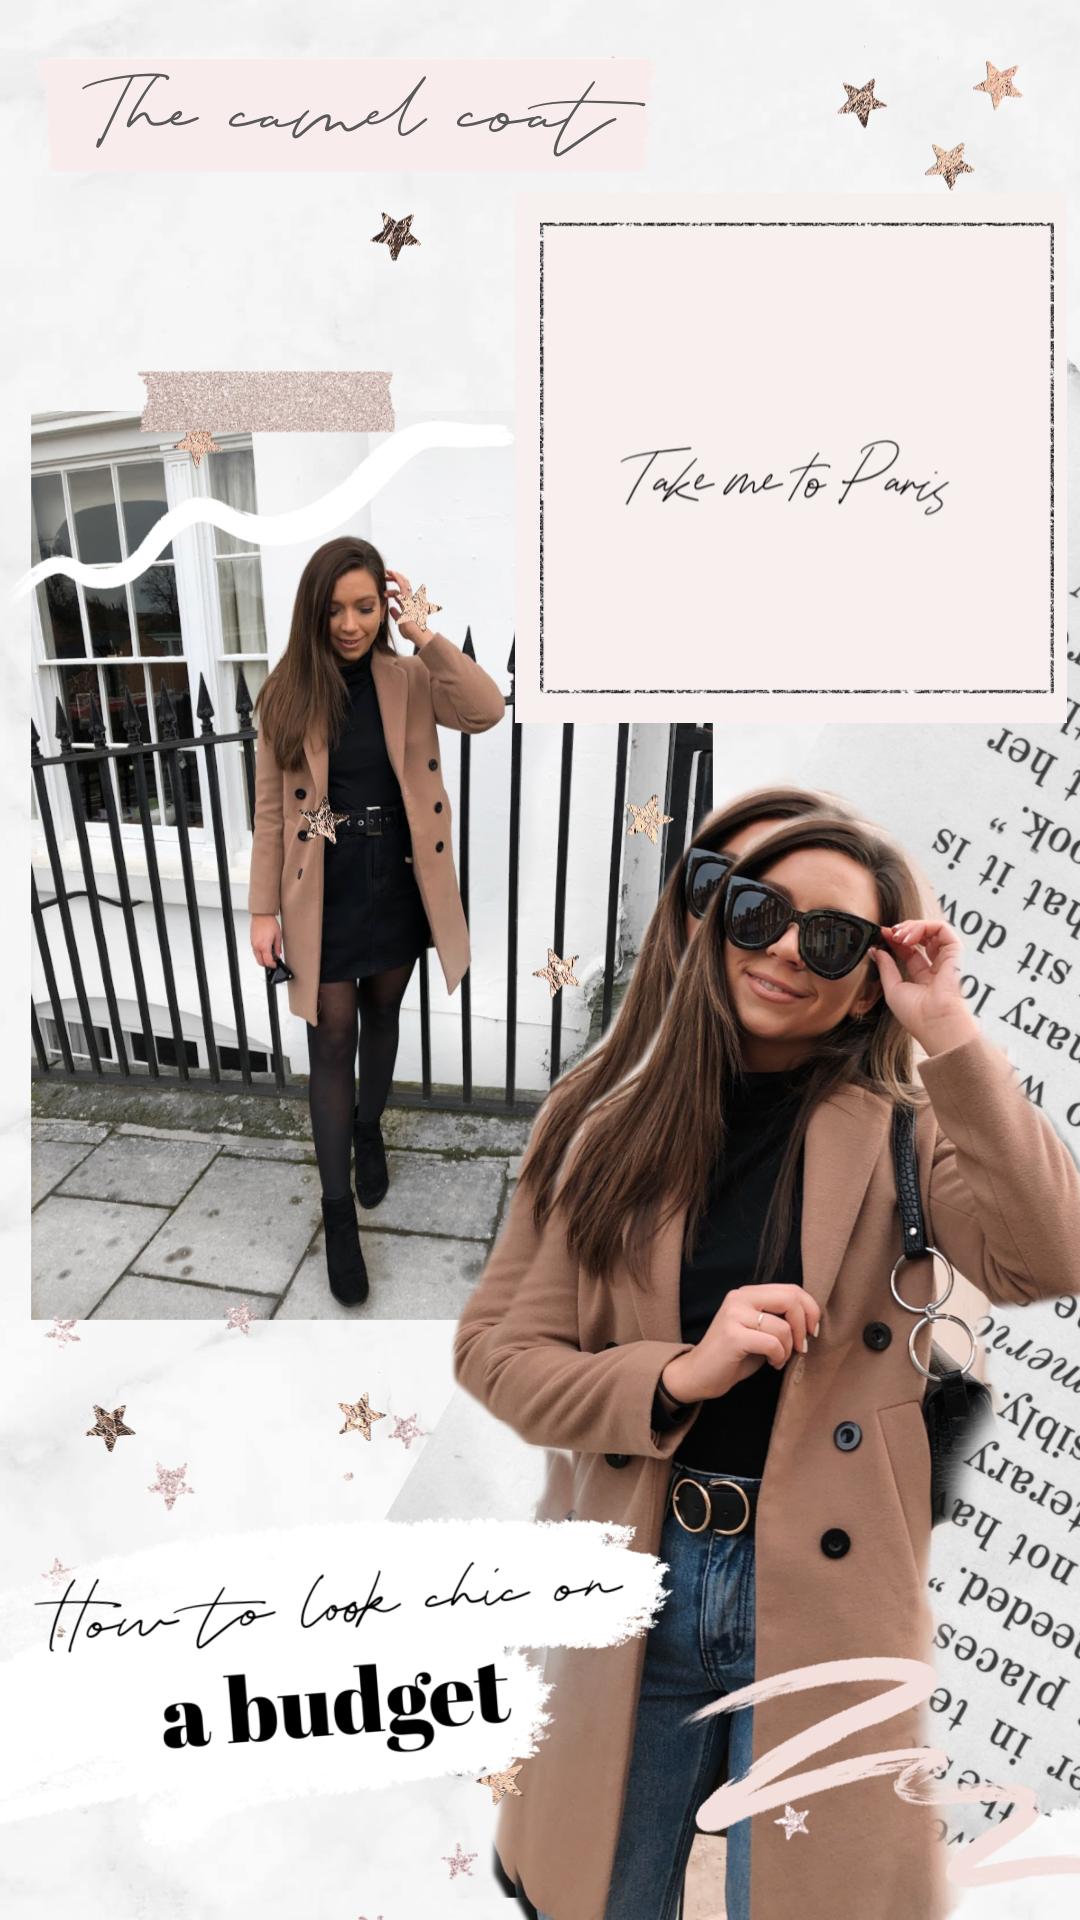 camel coat, chic coat, how to look chic on a budget, boohoo camel coat